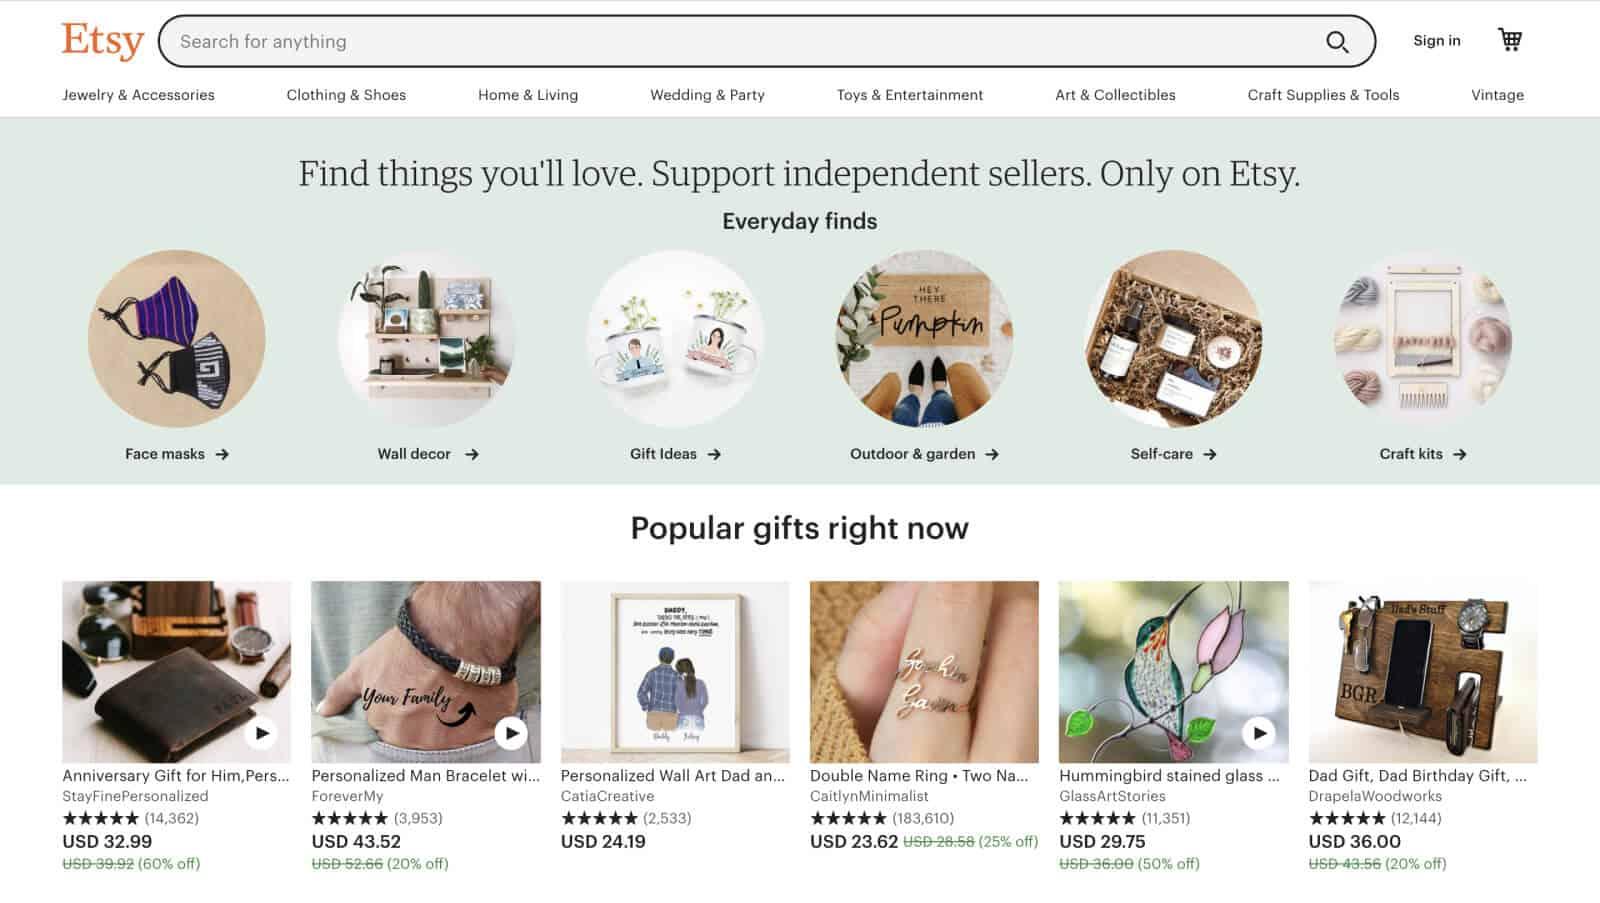 Etsy is the leading marketplace for handmade, artisanal goods